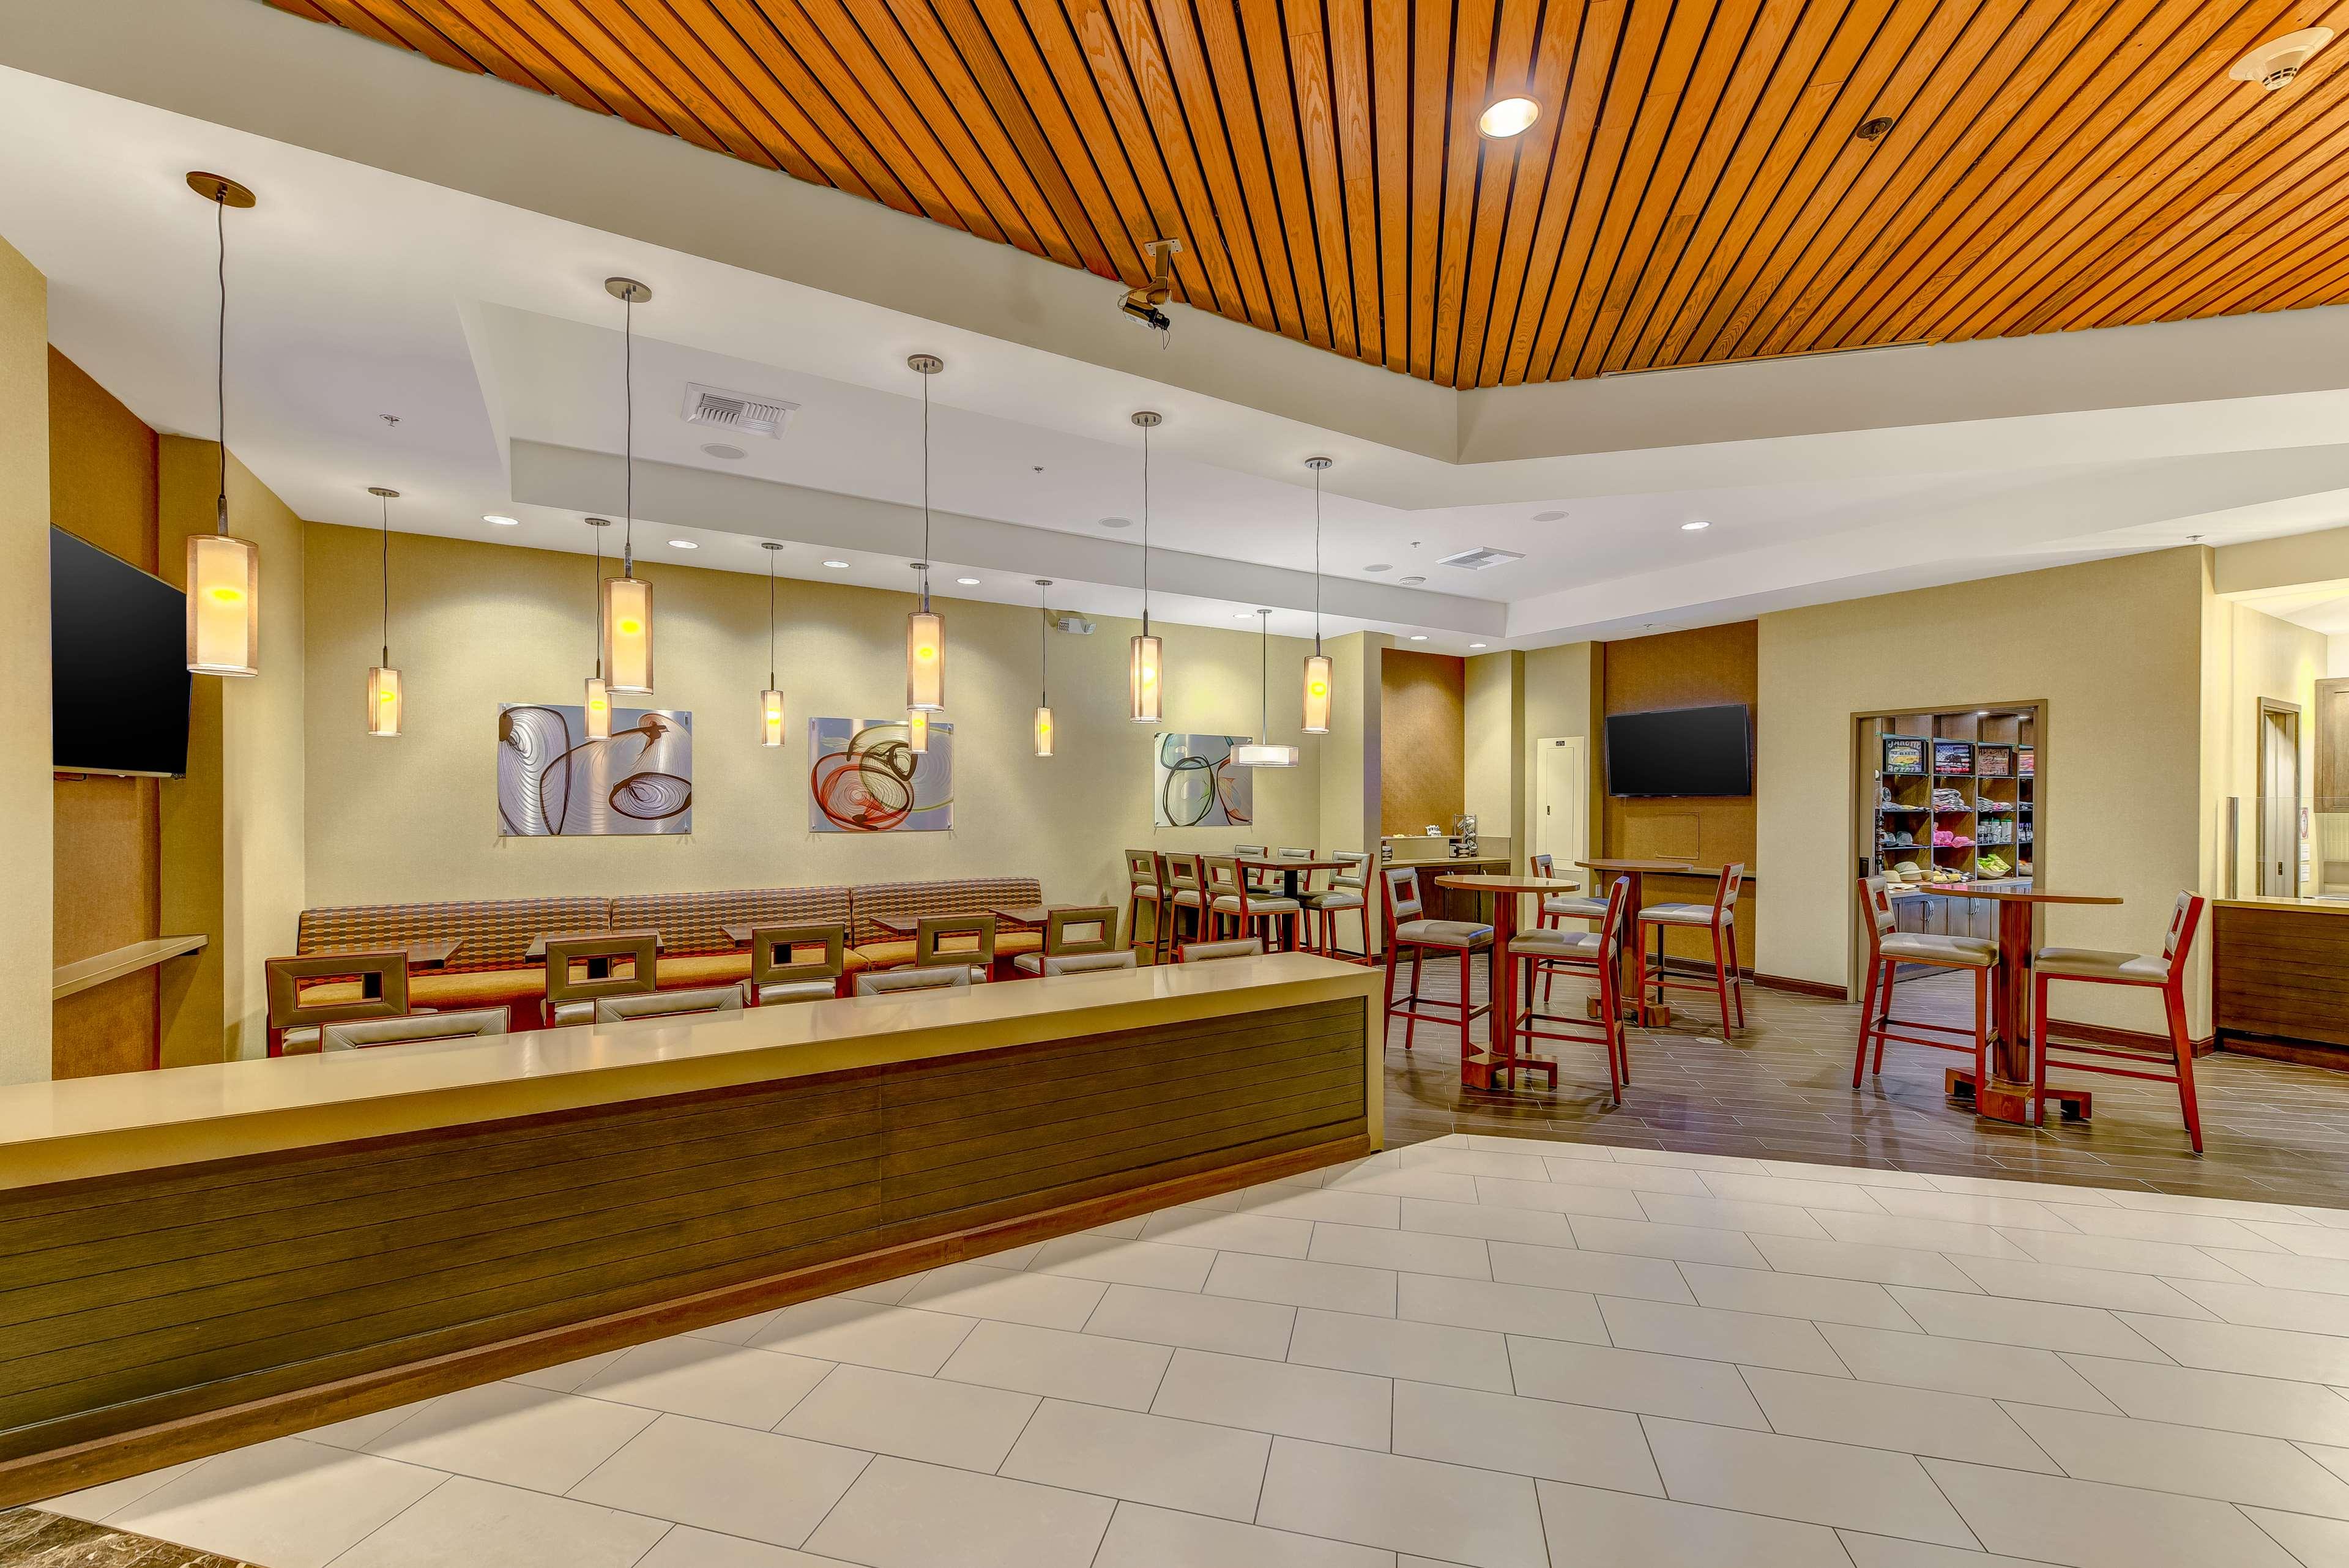 DoubleTree by Hilton Hotel Anaheim - Orange County image 26